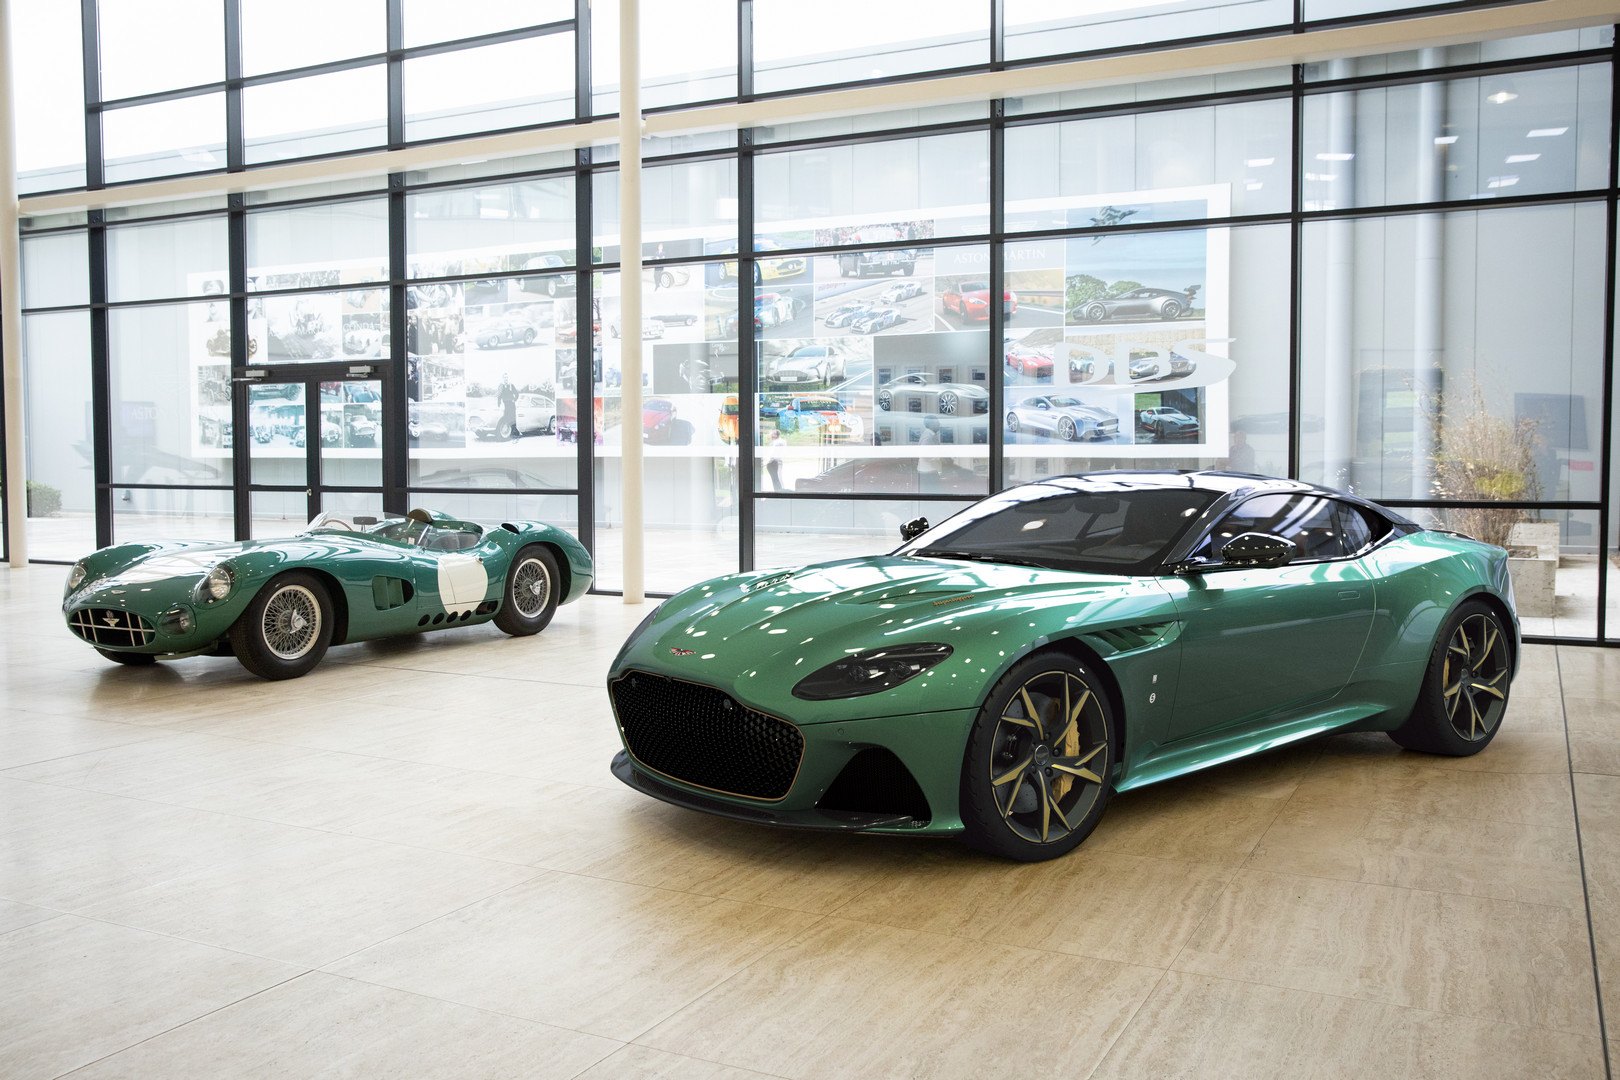 Aston Martin Dbs Superleggera 59 Revealed To Honor Dbr1 Le